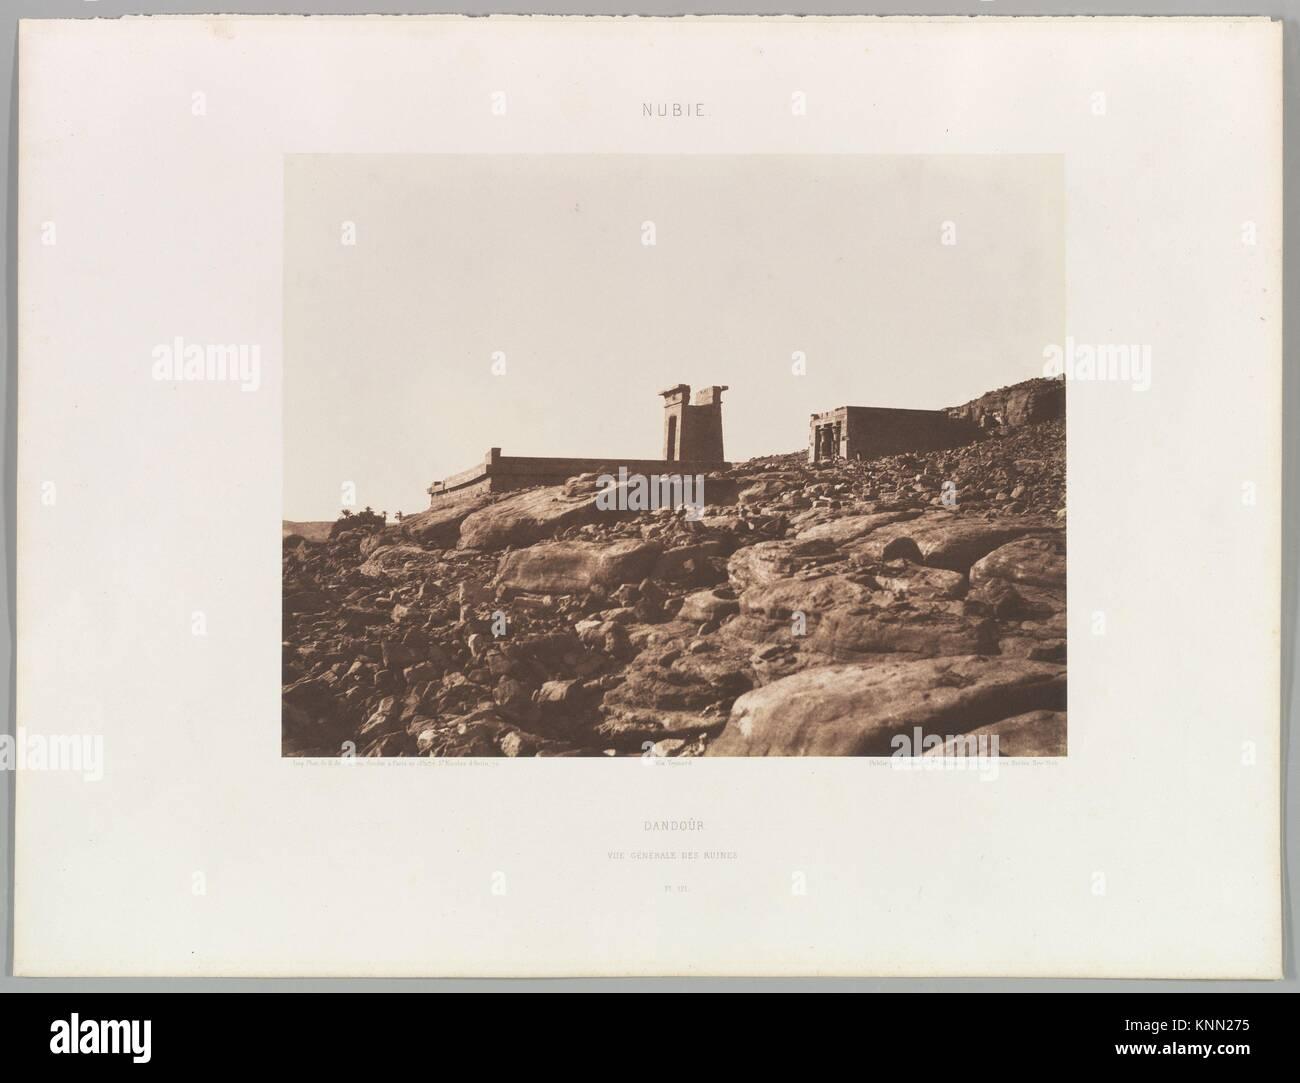 Dandoûr, Nubie. Artist: Félix Teynard (French, 1817-1892); Date: 1851; Medium: Salted paper print from - Stock Image